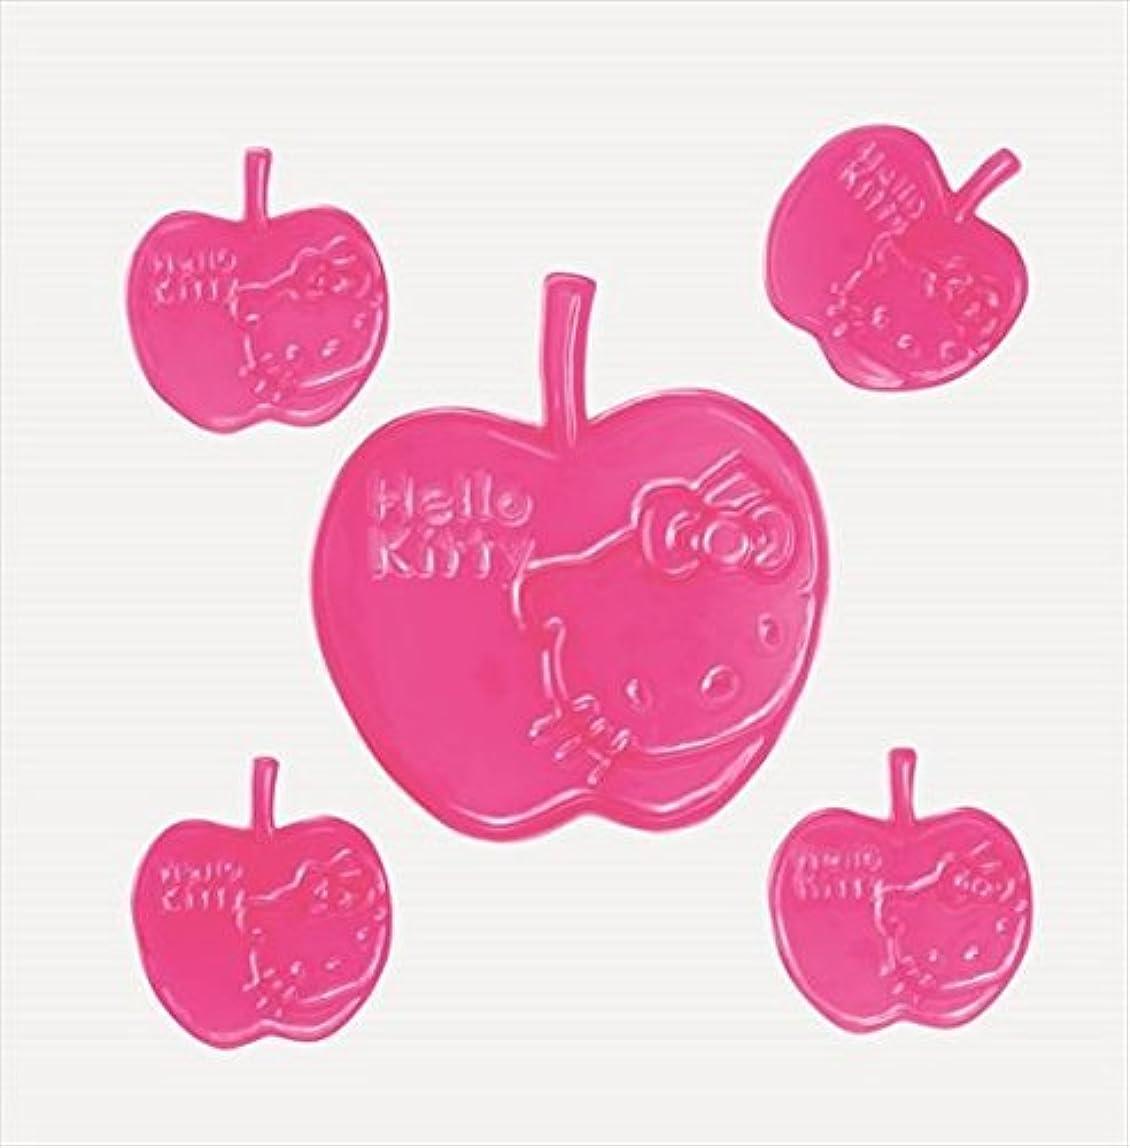 GelGems(ジェルジェム) ジェルジェムハローキティバッグS 「 ピンクリンゴ 」 E1200002 キャンドル 200x255x5mm (E1200002)